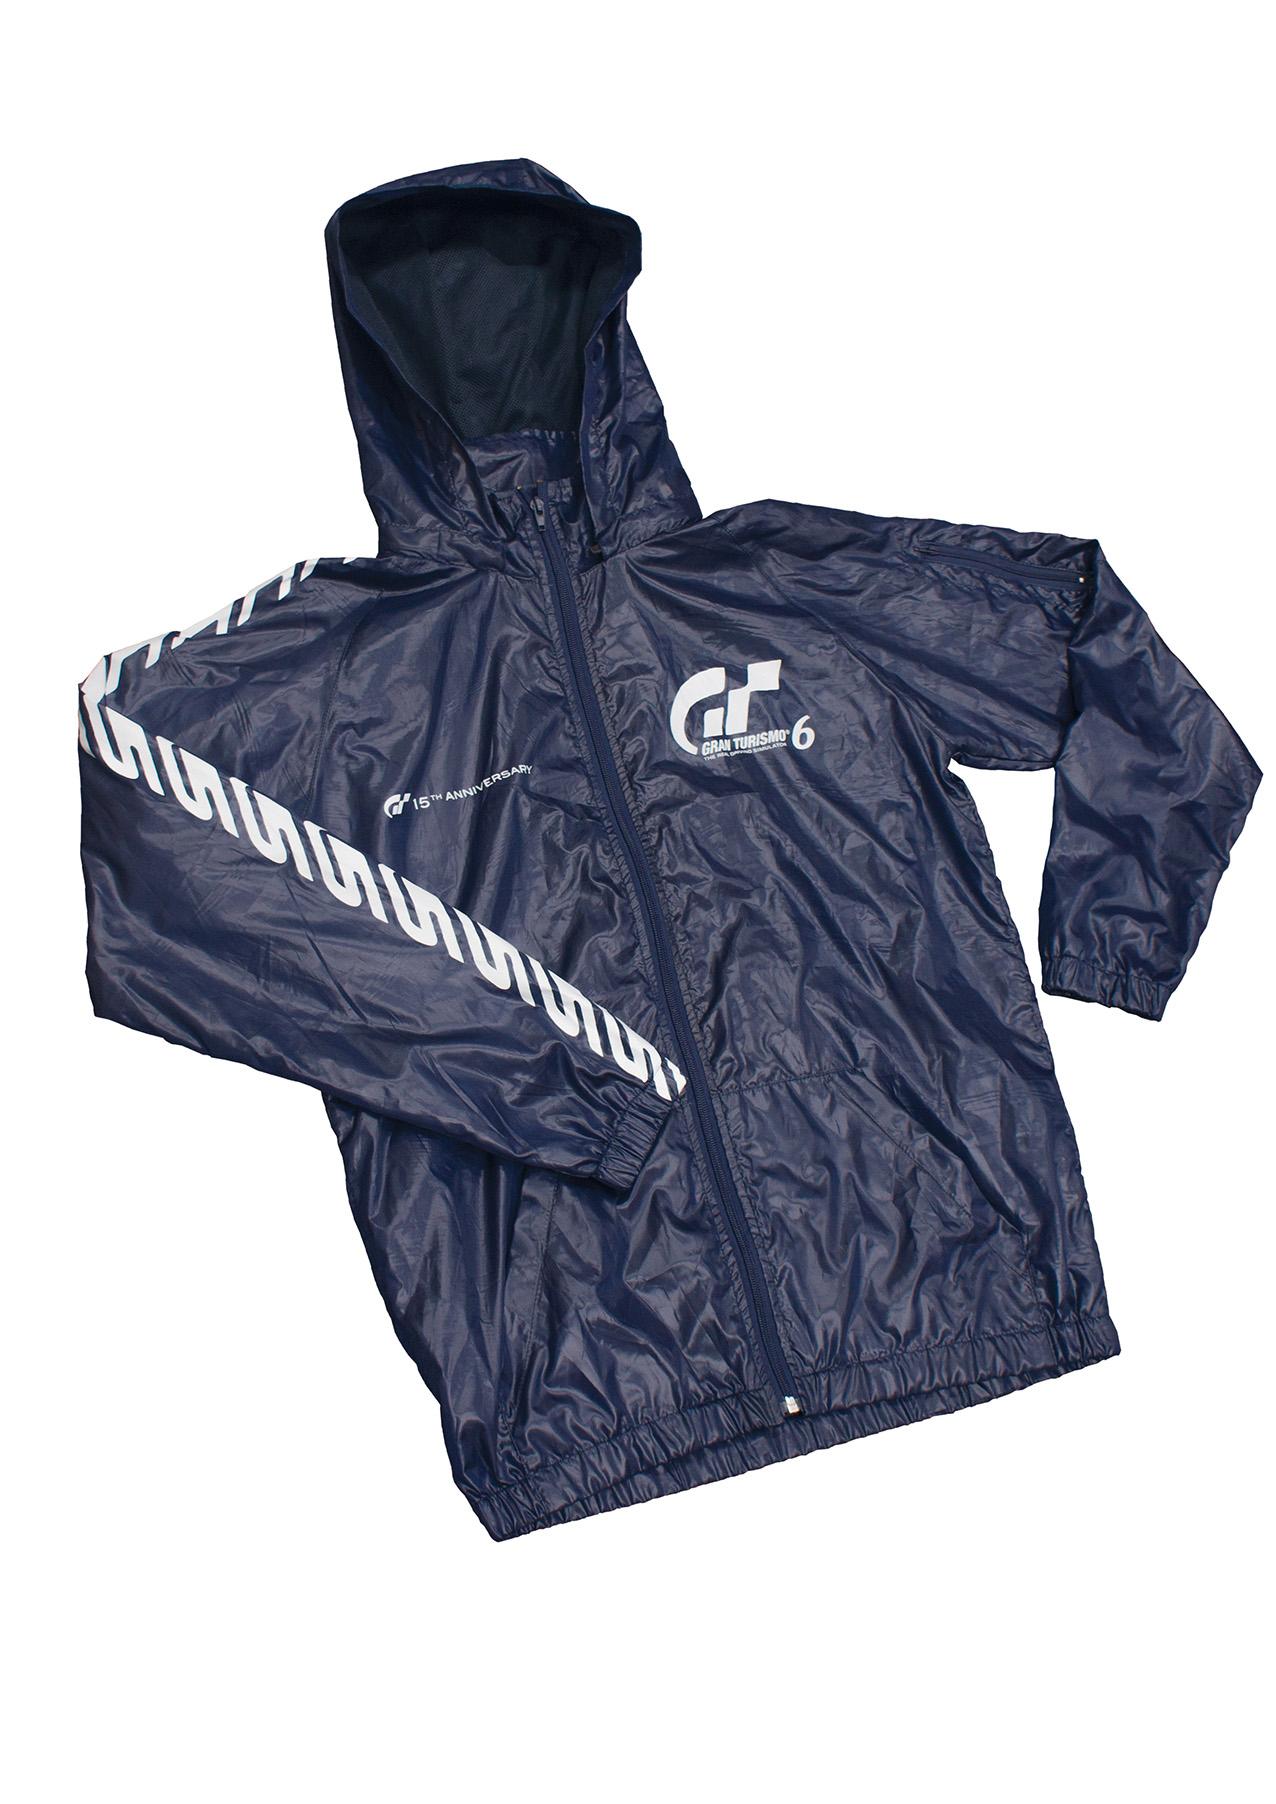 GT6_jacket